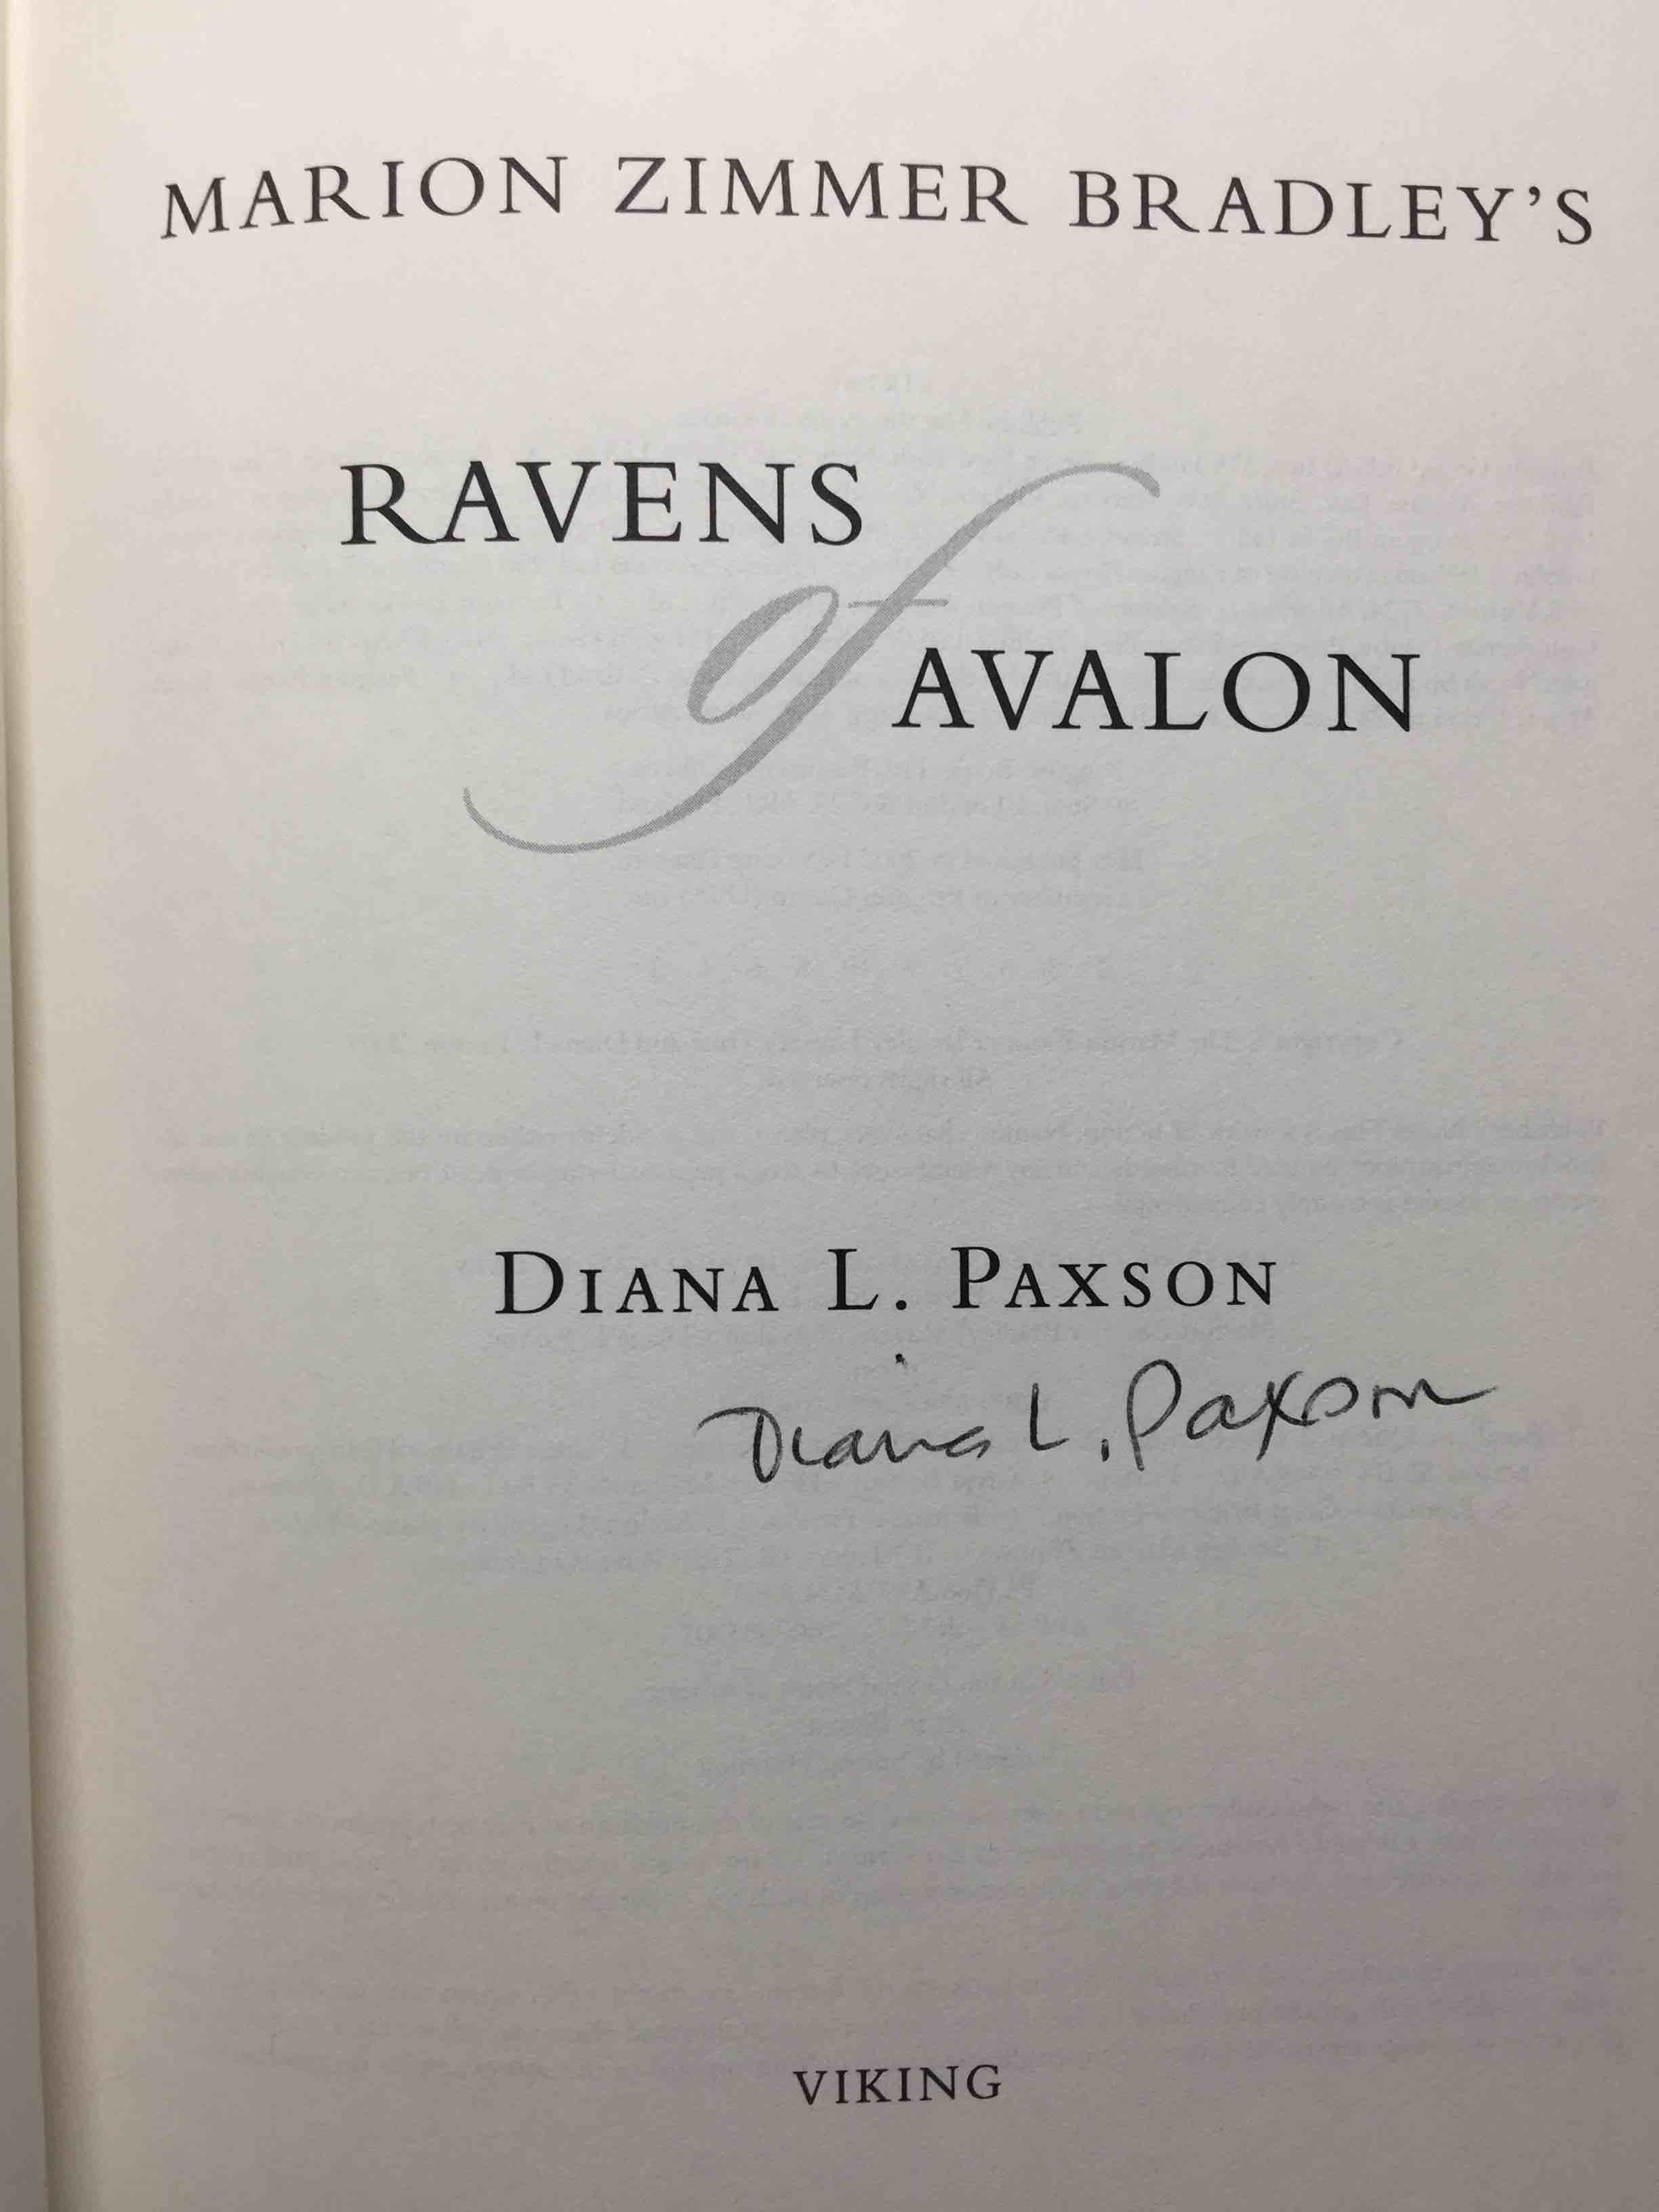 marion zimmer bradley s ravens of avalon paxson diana l